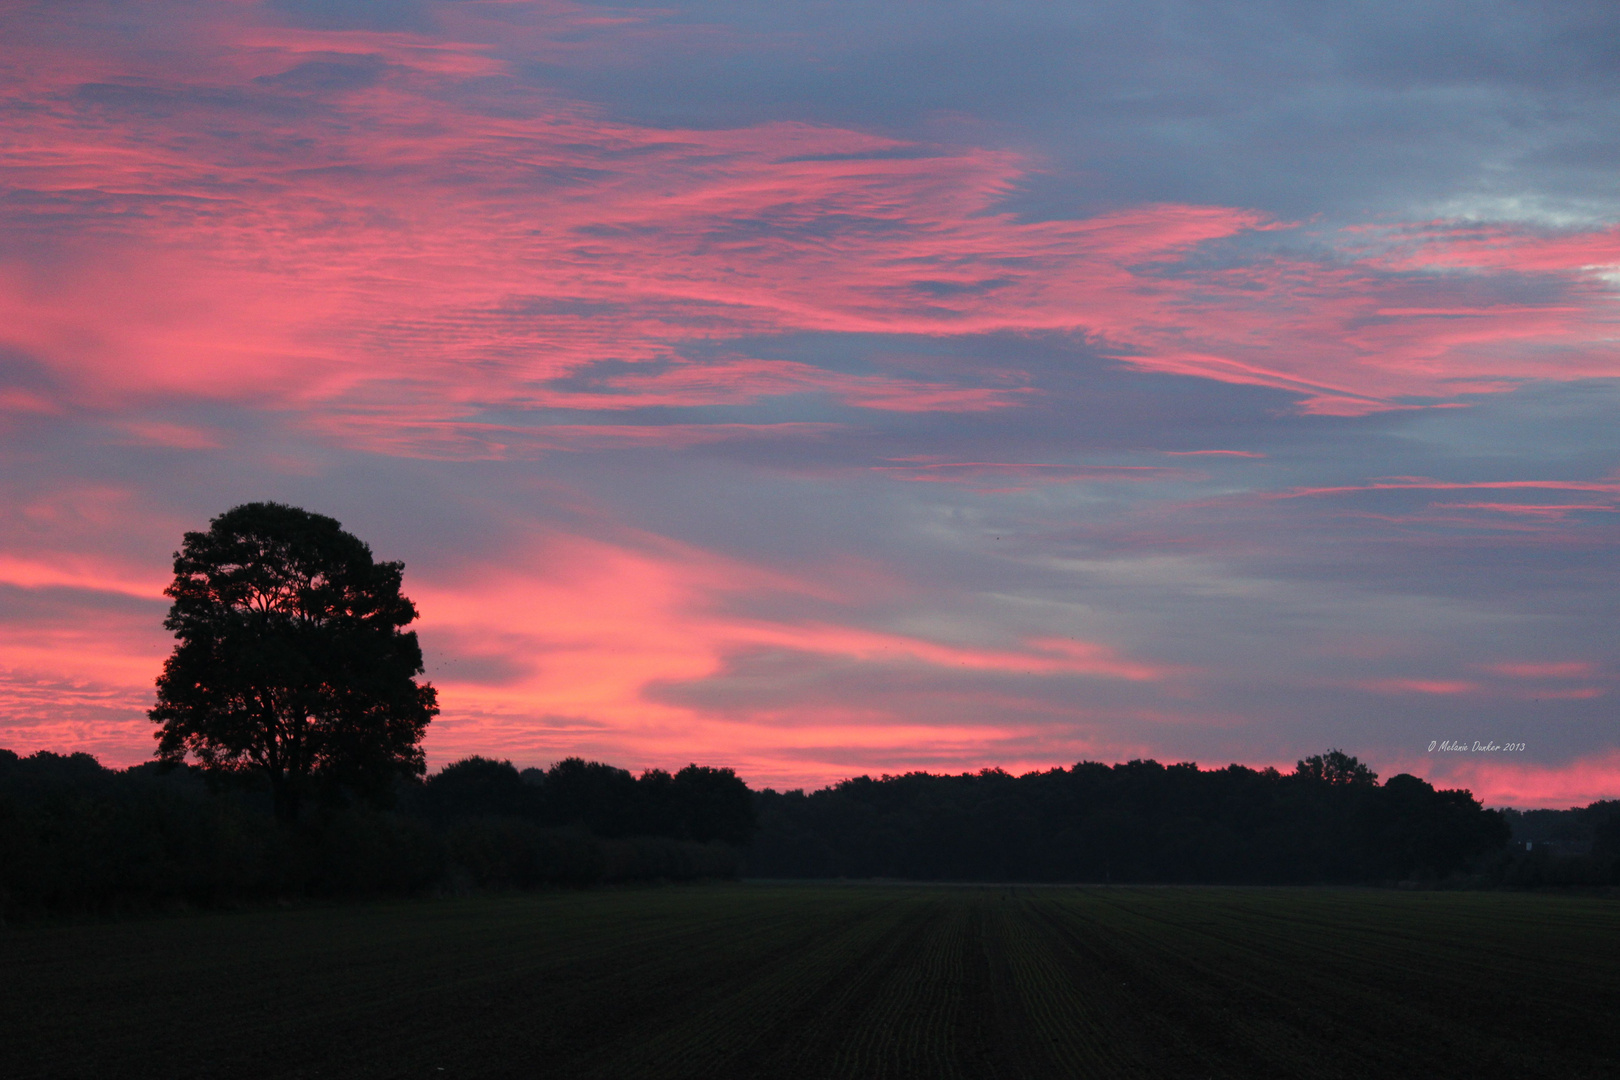 Sonnenaufgang;Achimer-Marsch